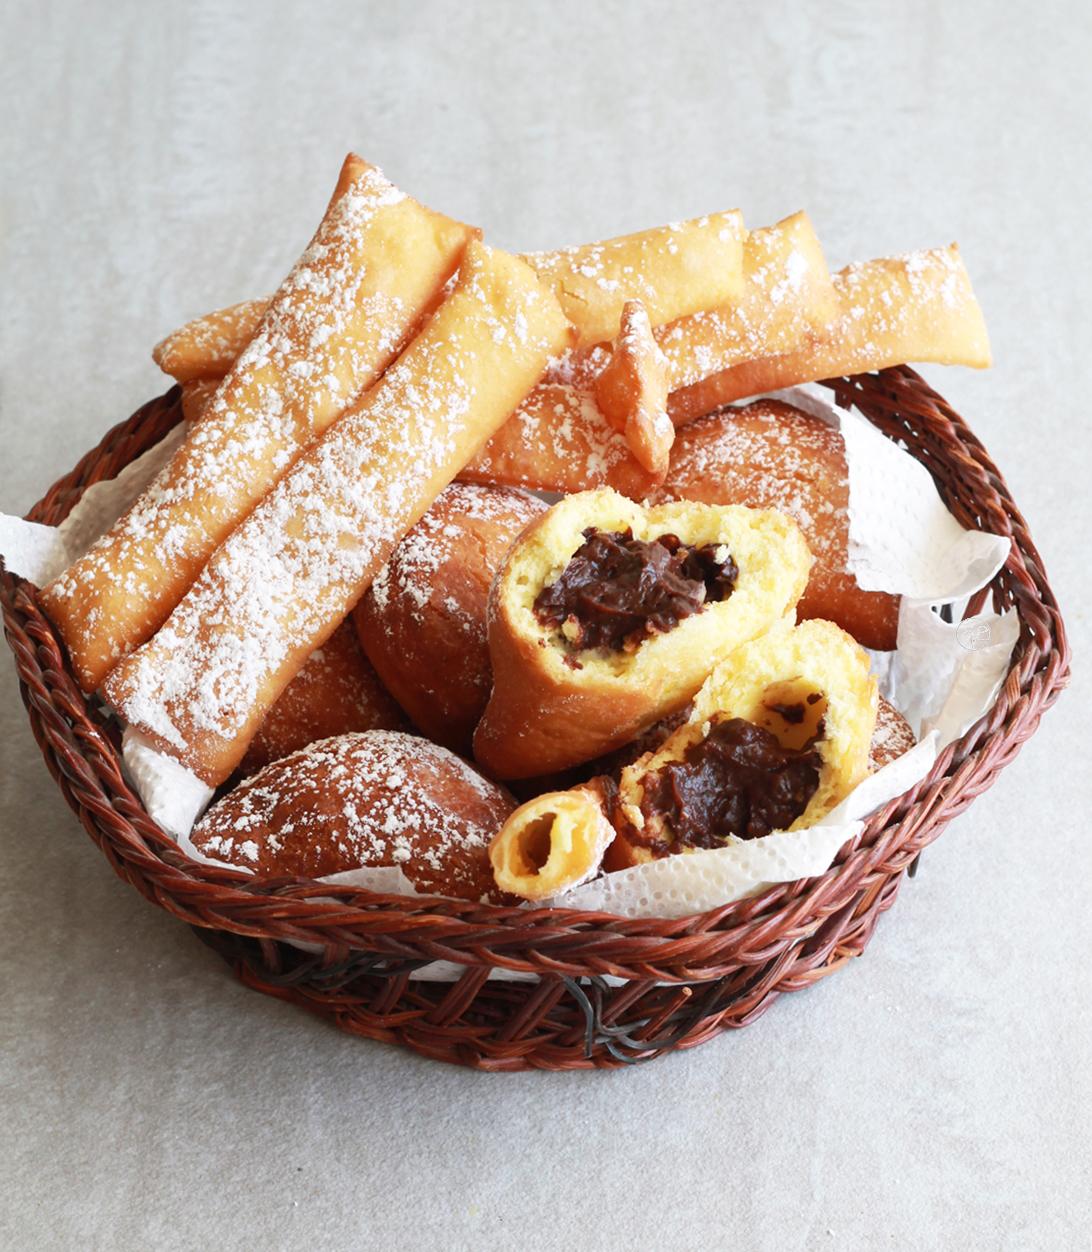 Ravioli dolci al cioccolato senza glutine - La Cassata Celiaca